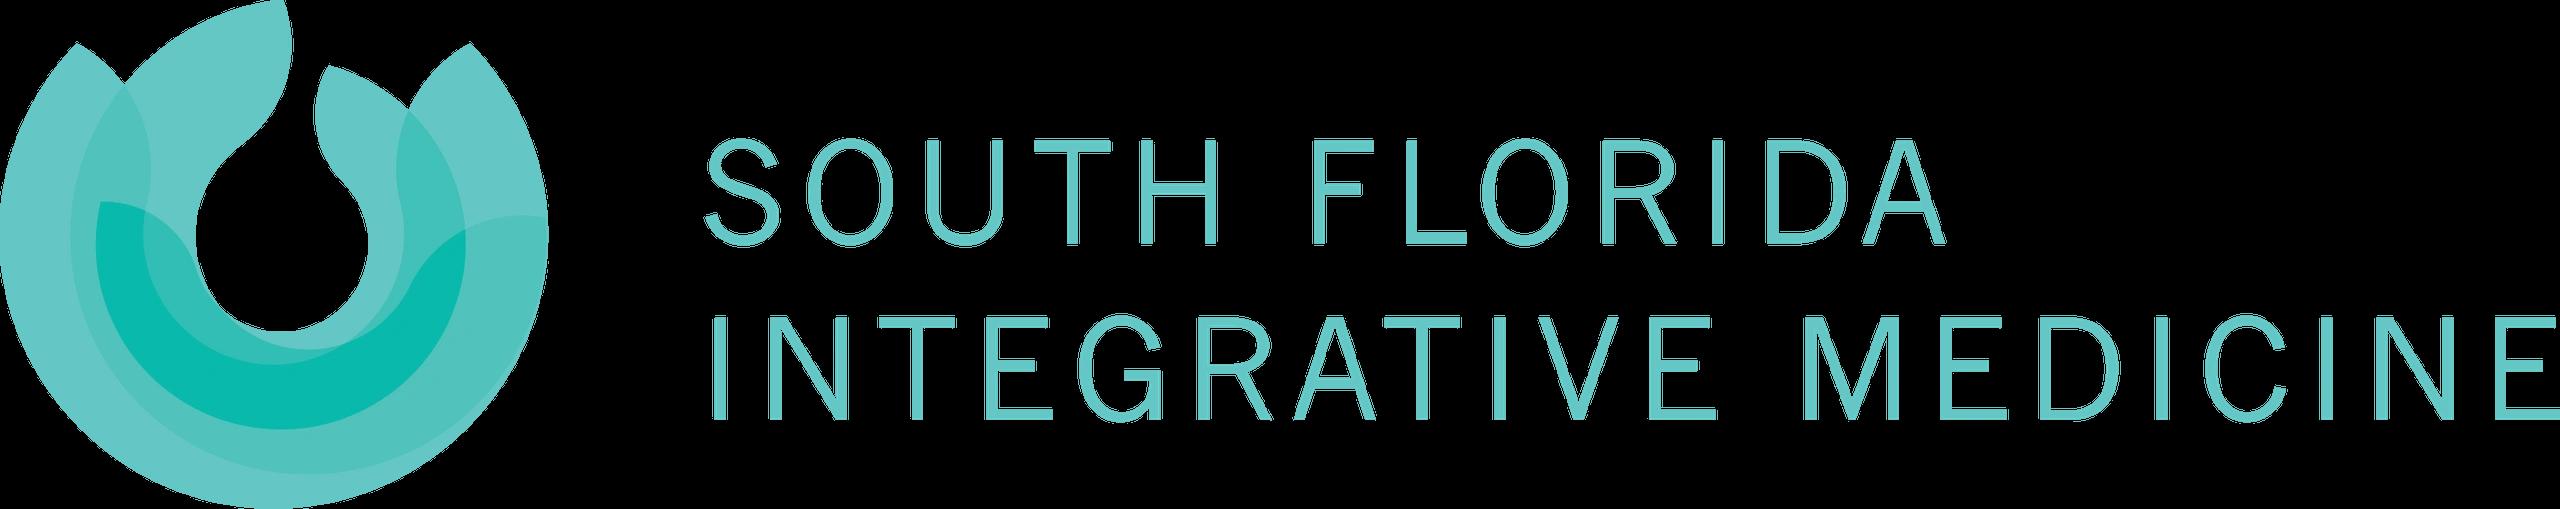 South Florida Integrative Medicine